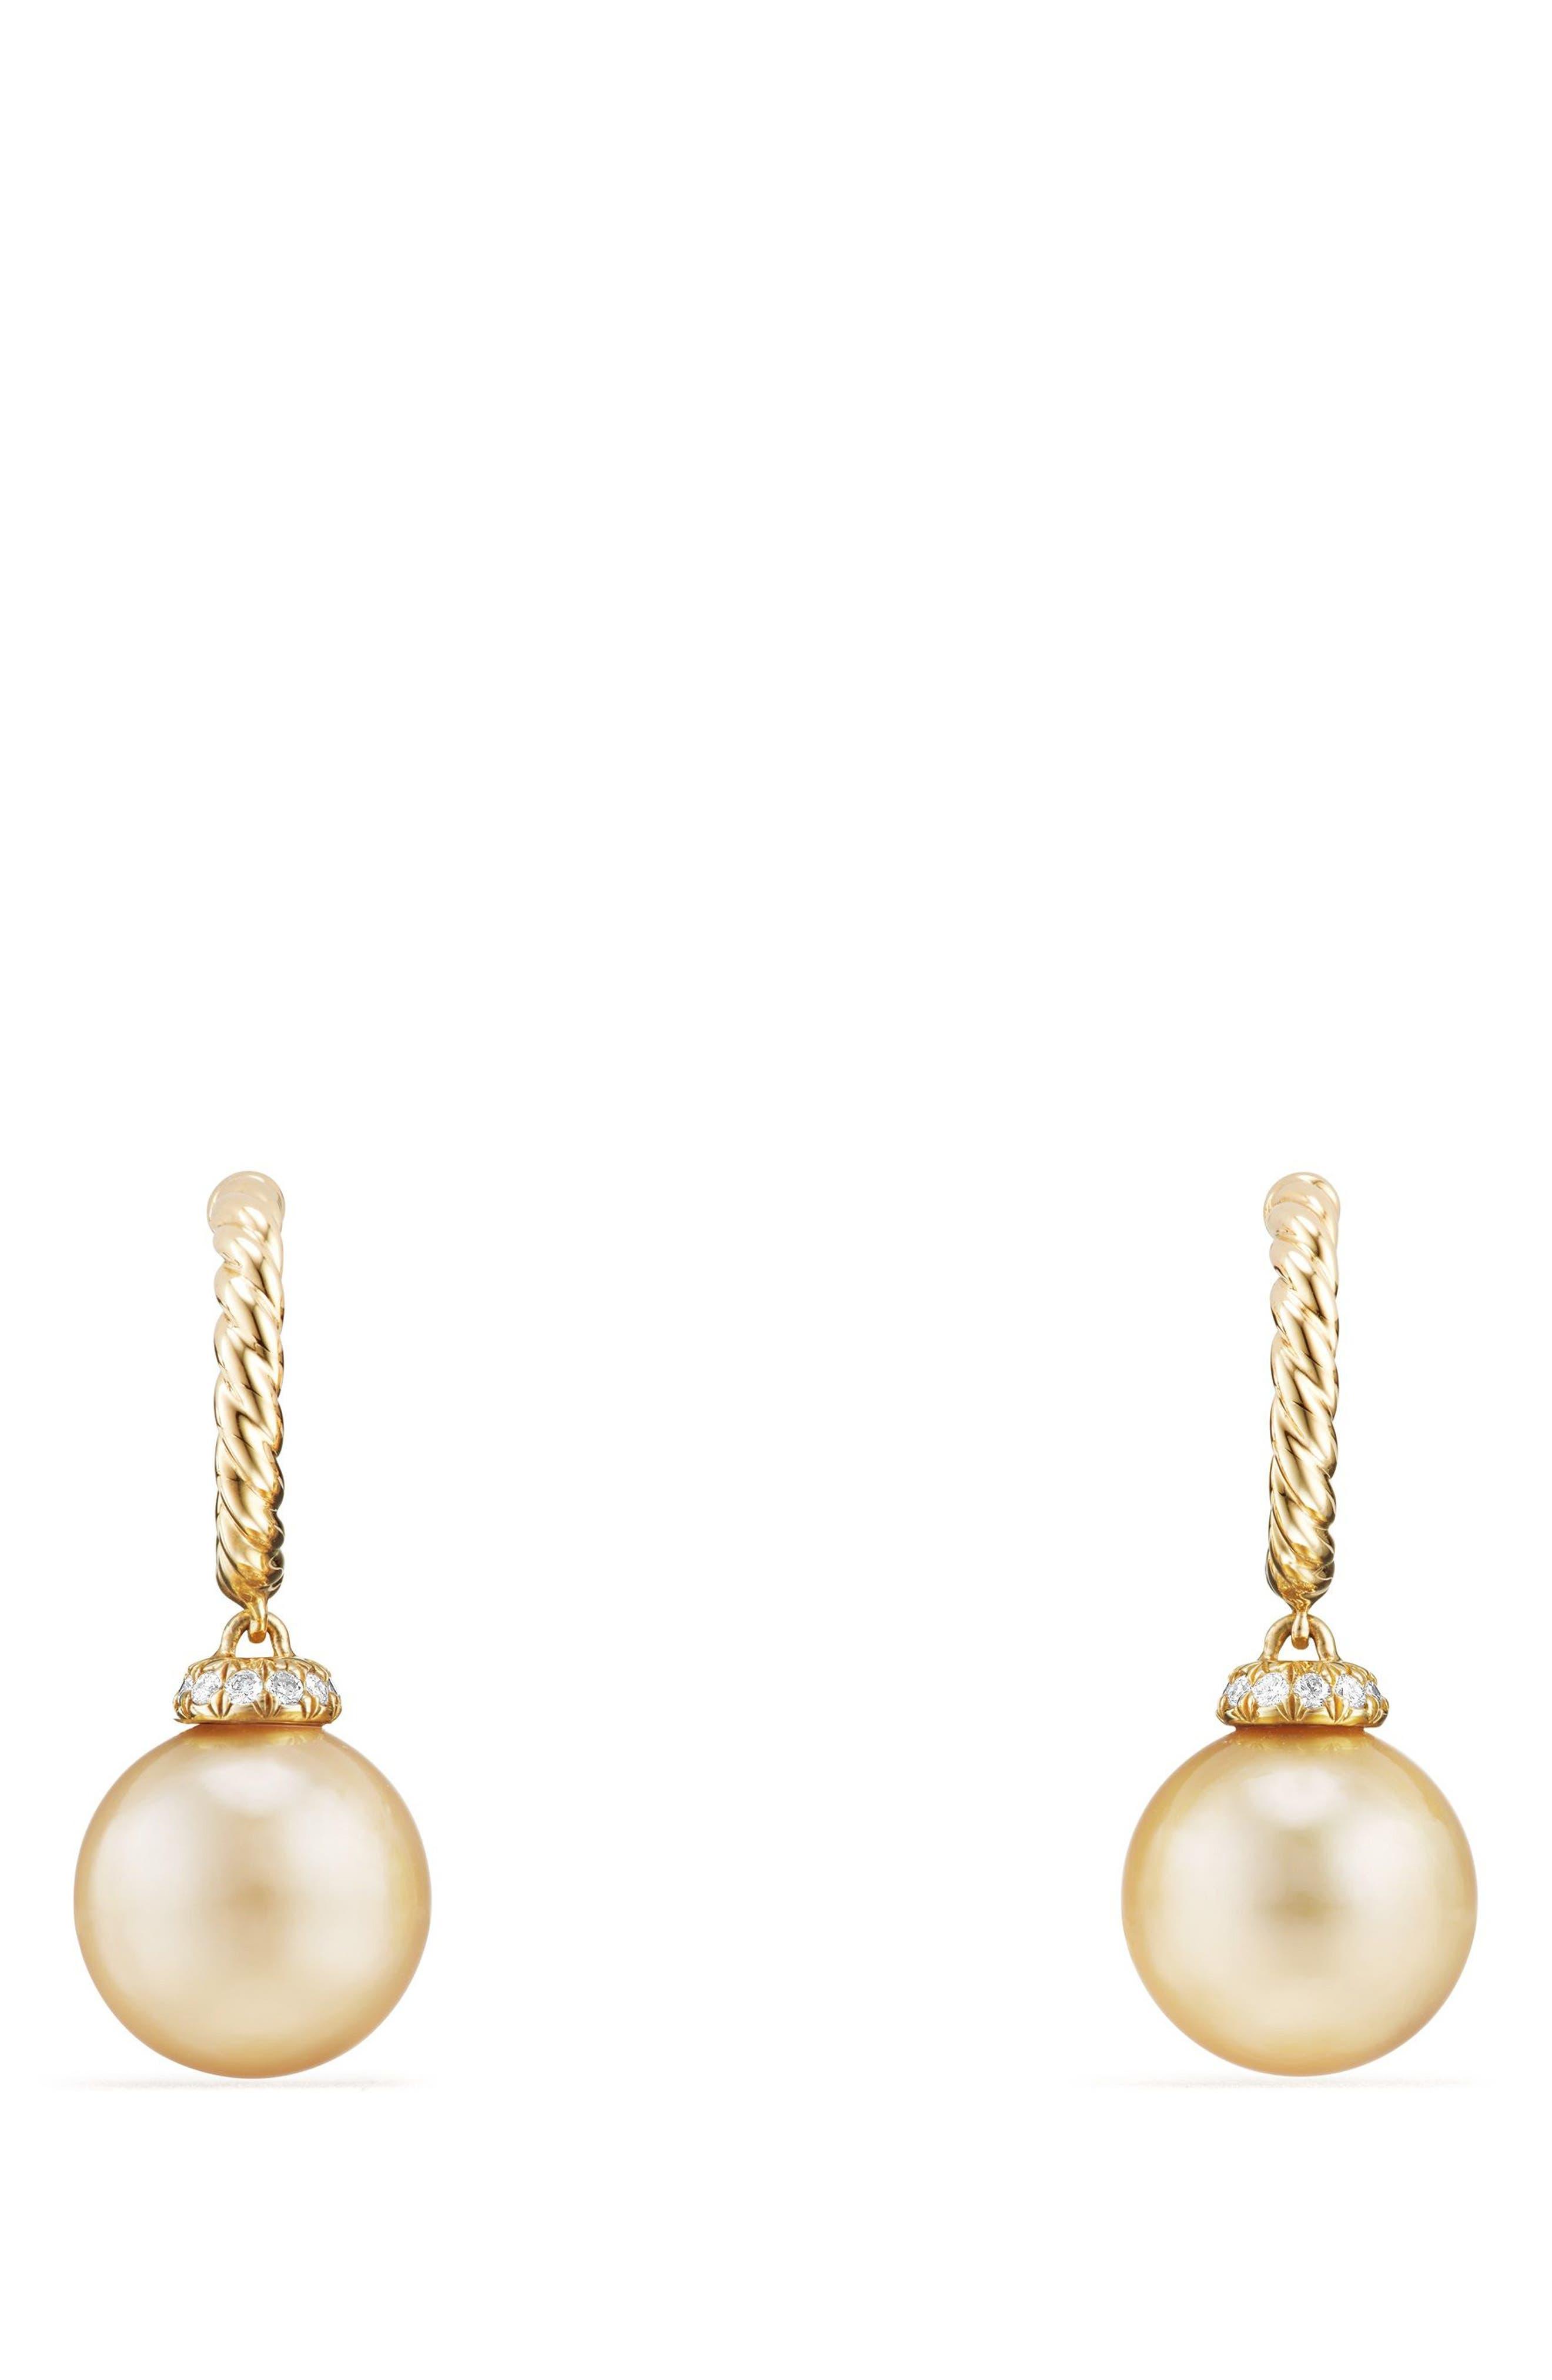 Solari Hoop Earrings with Diamonds and Genuine Pearl,                         Main,                         color, Gold/ Diamond/ Yellow Pearl